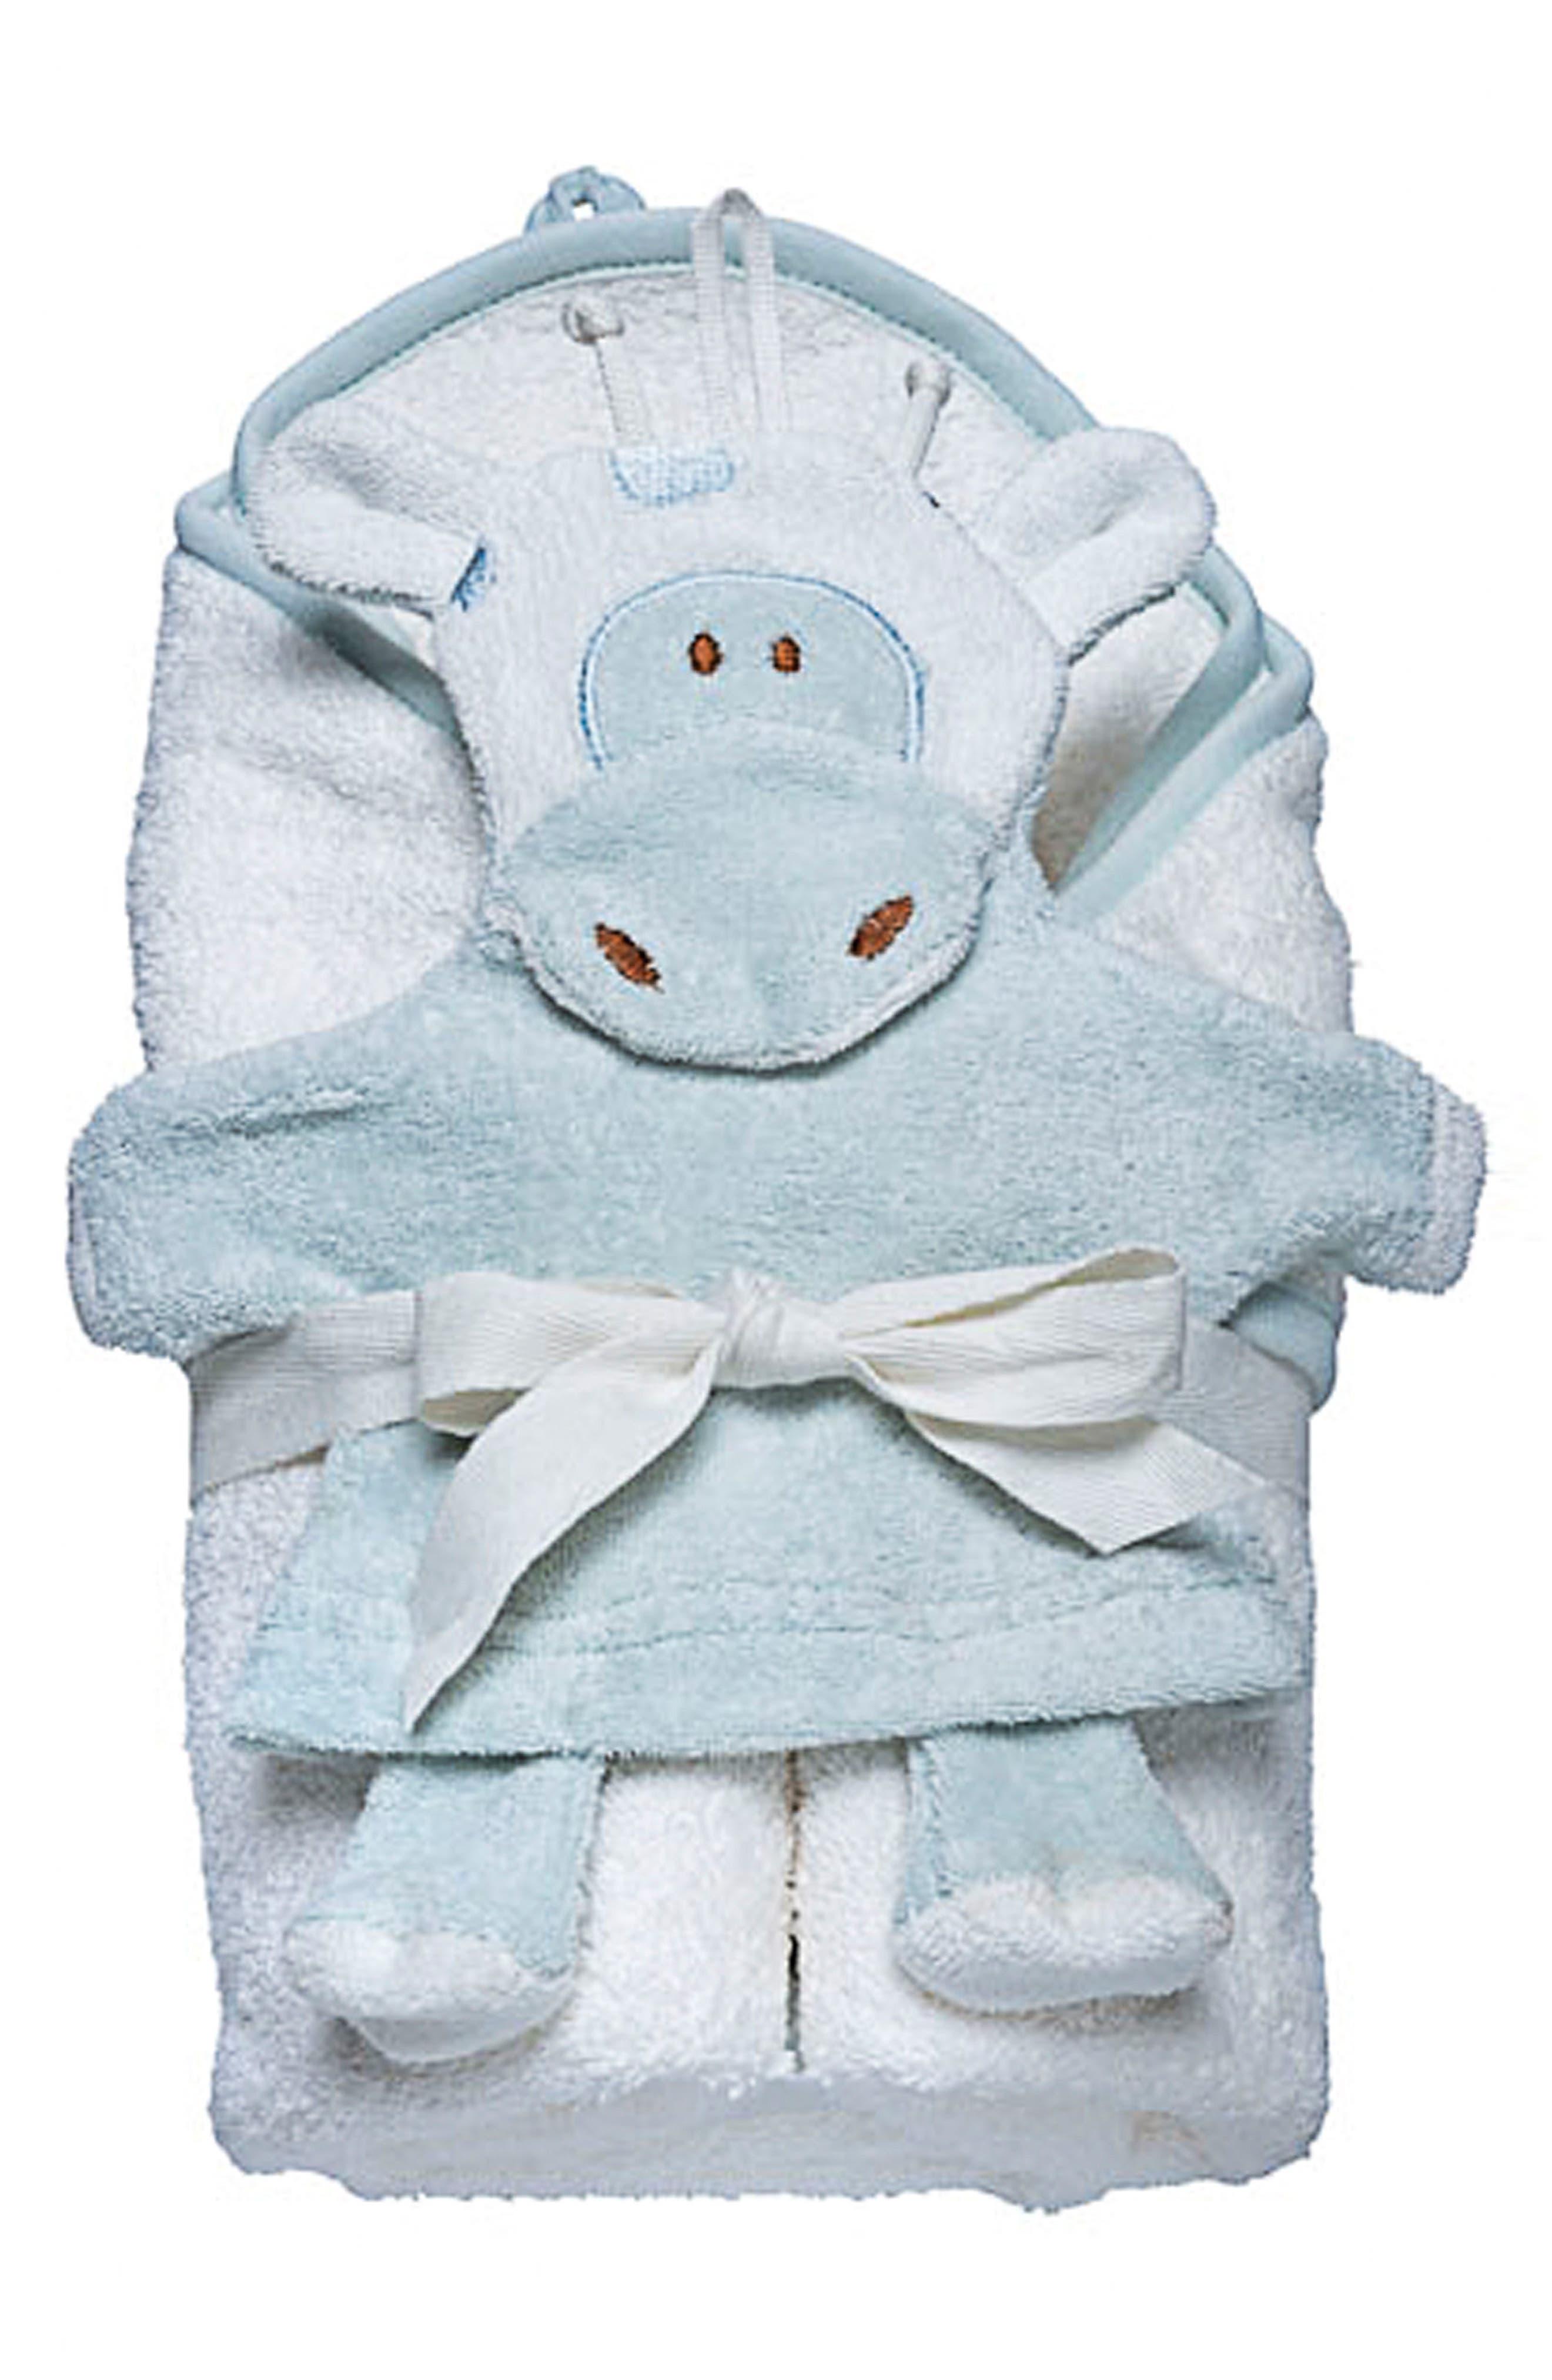 Hooded Towel & Bath Mitt Set,                         Main,                         color, WHITE